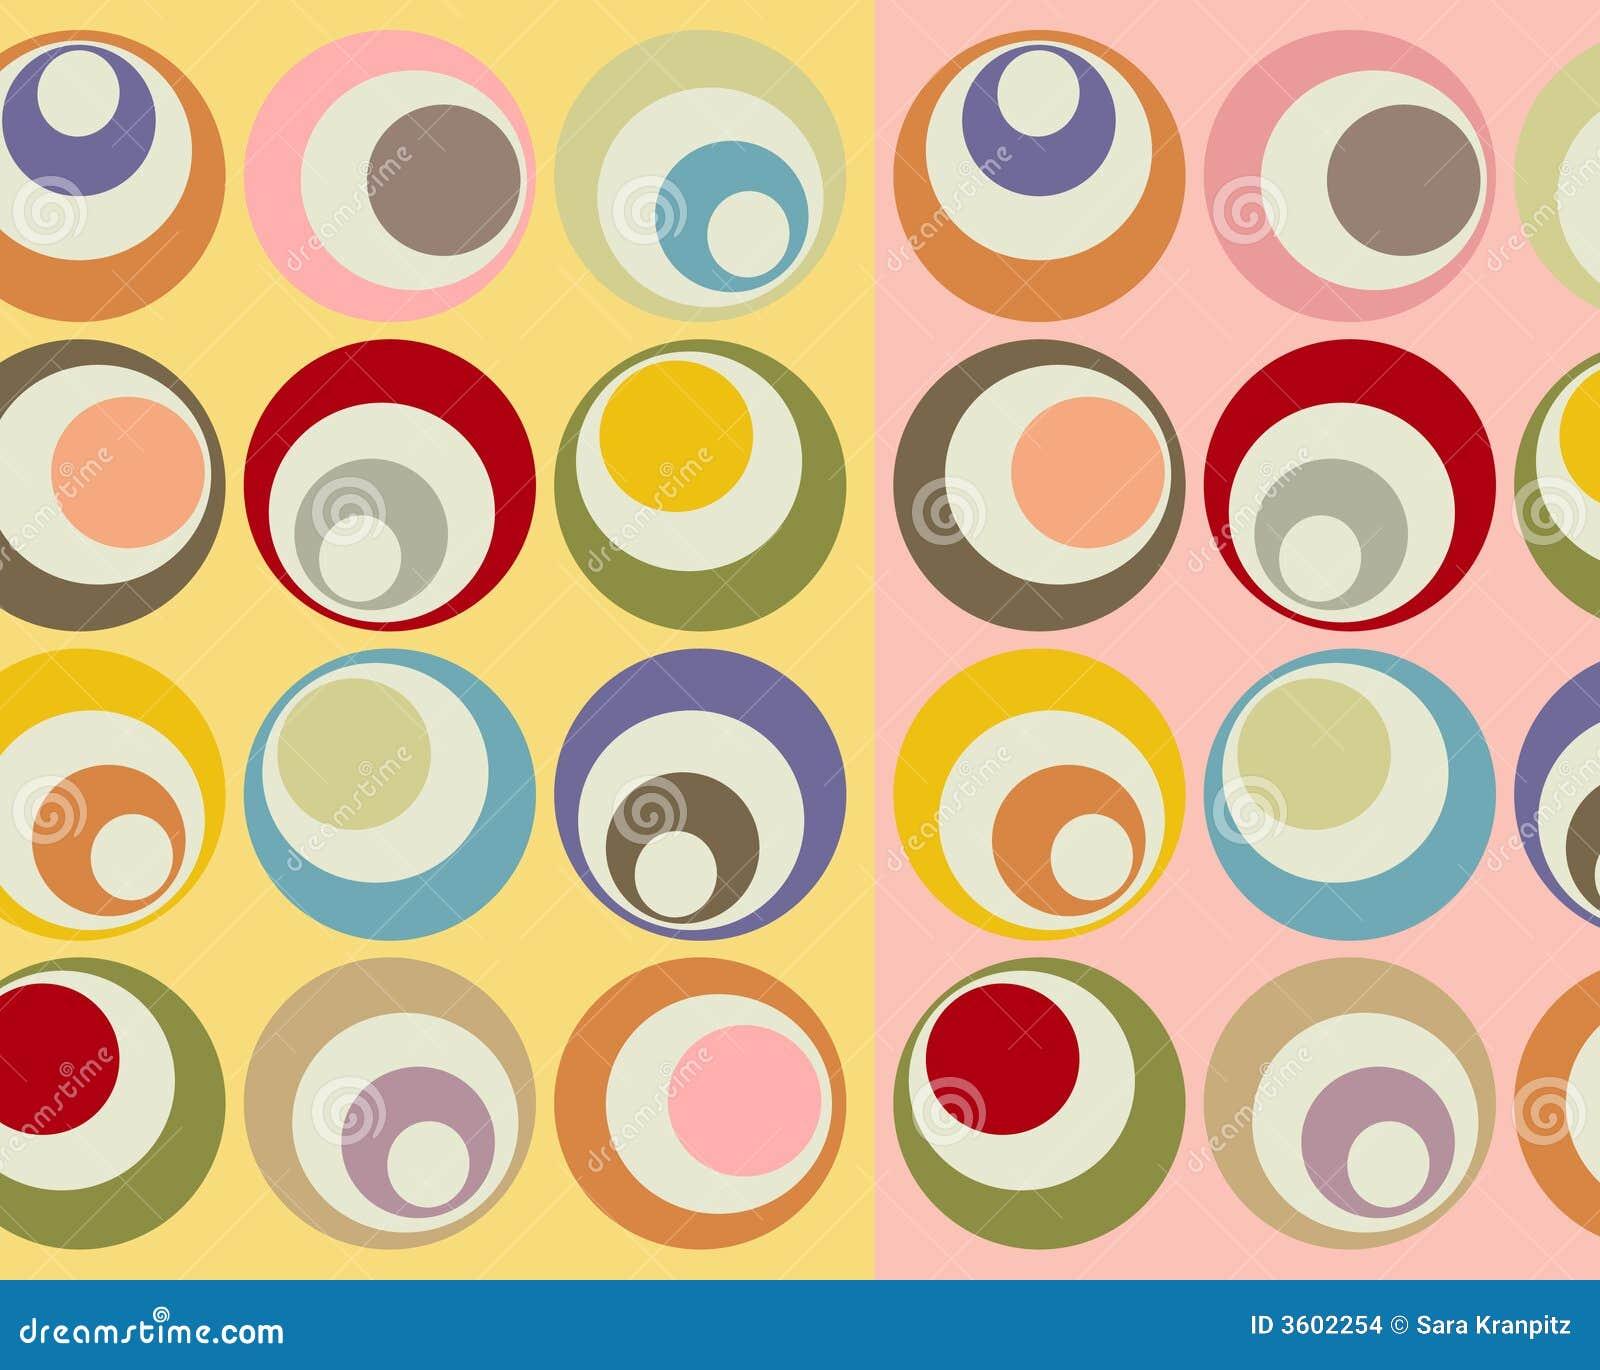 Retro colorful circles collage